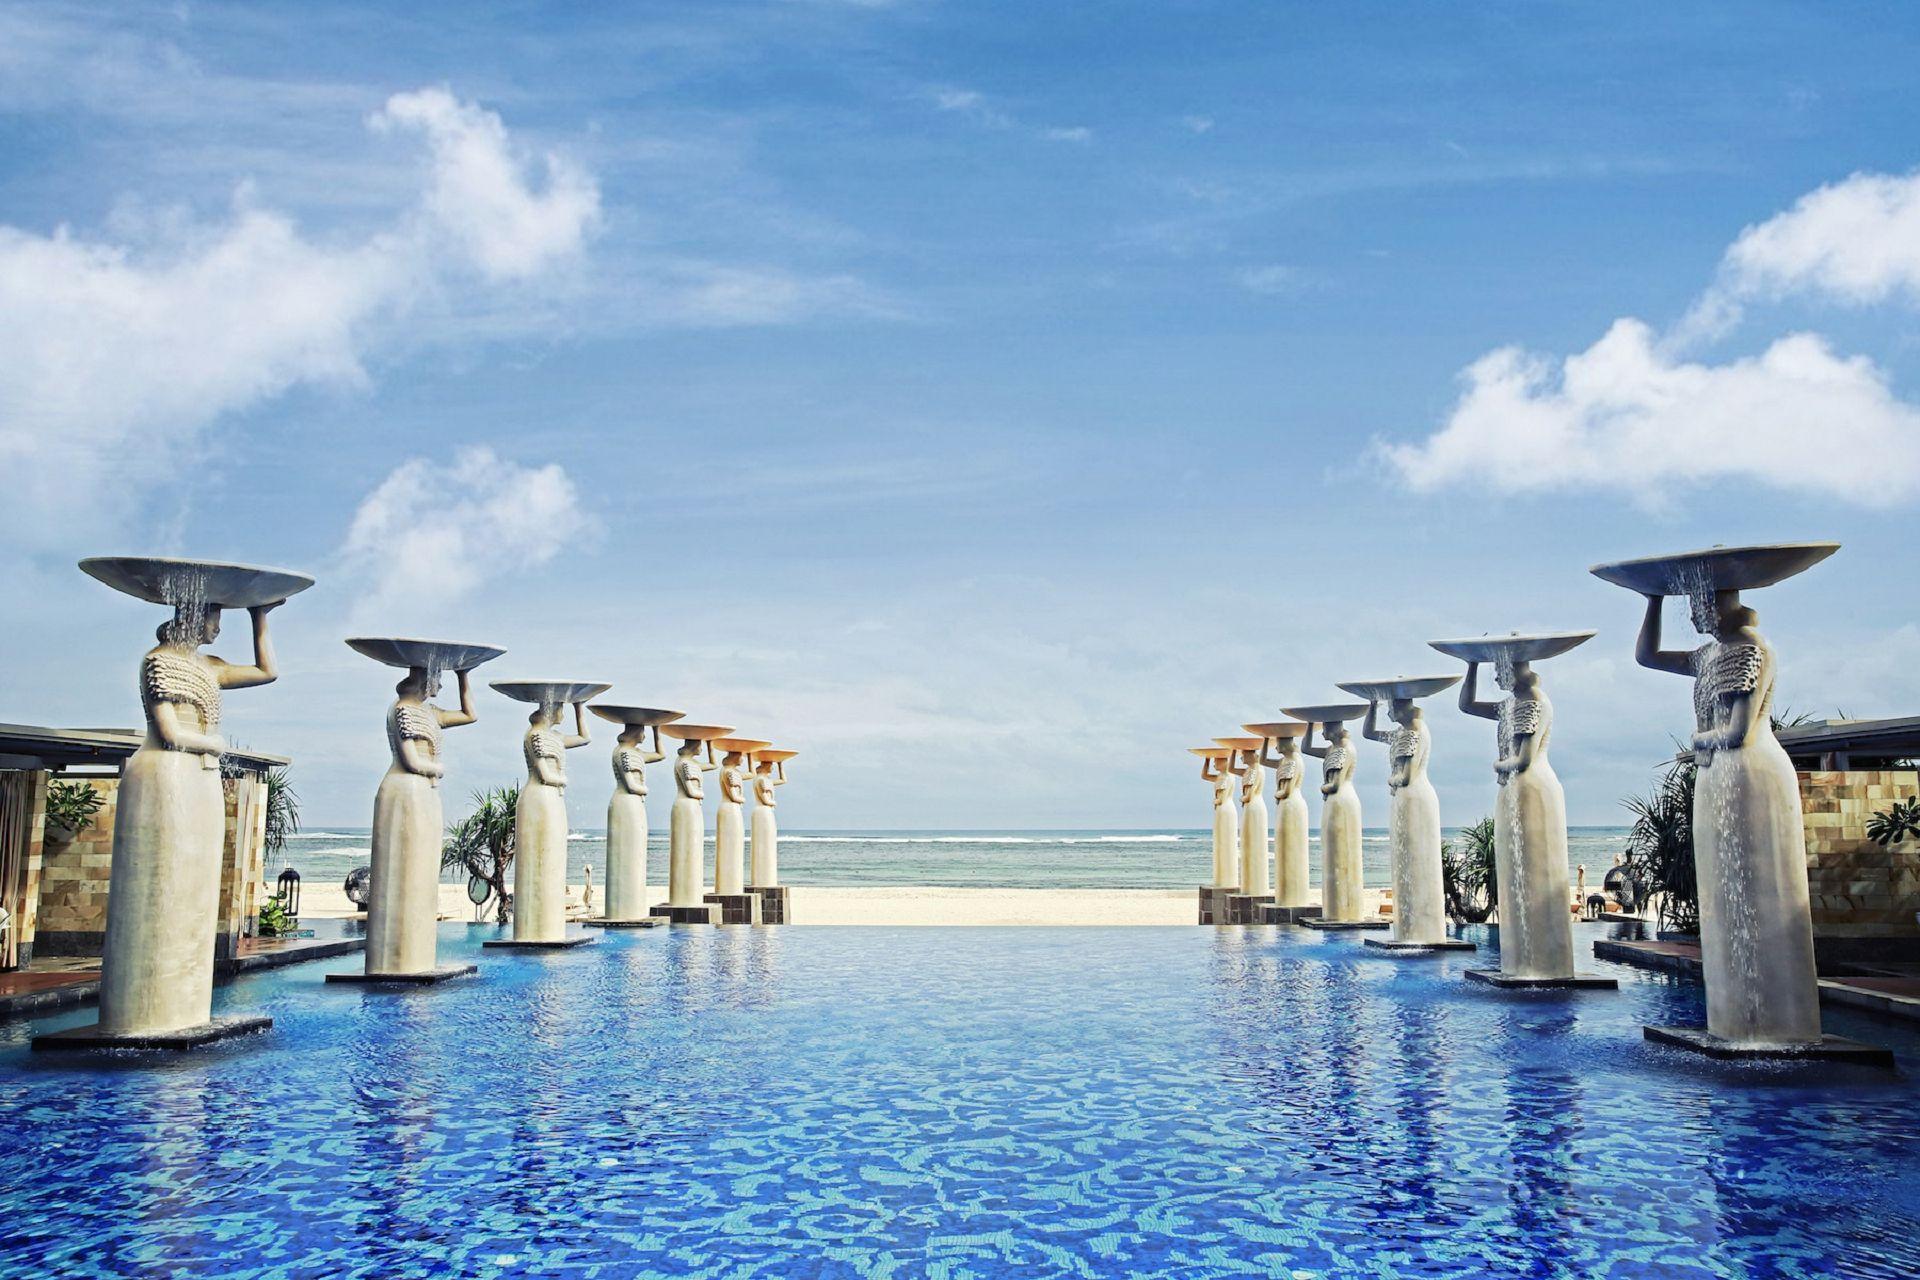 Bali-HD-Wallpaper.jpg (1920×1280)   Bali, Hotel piscine ...